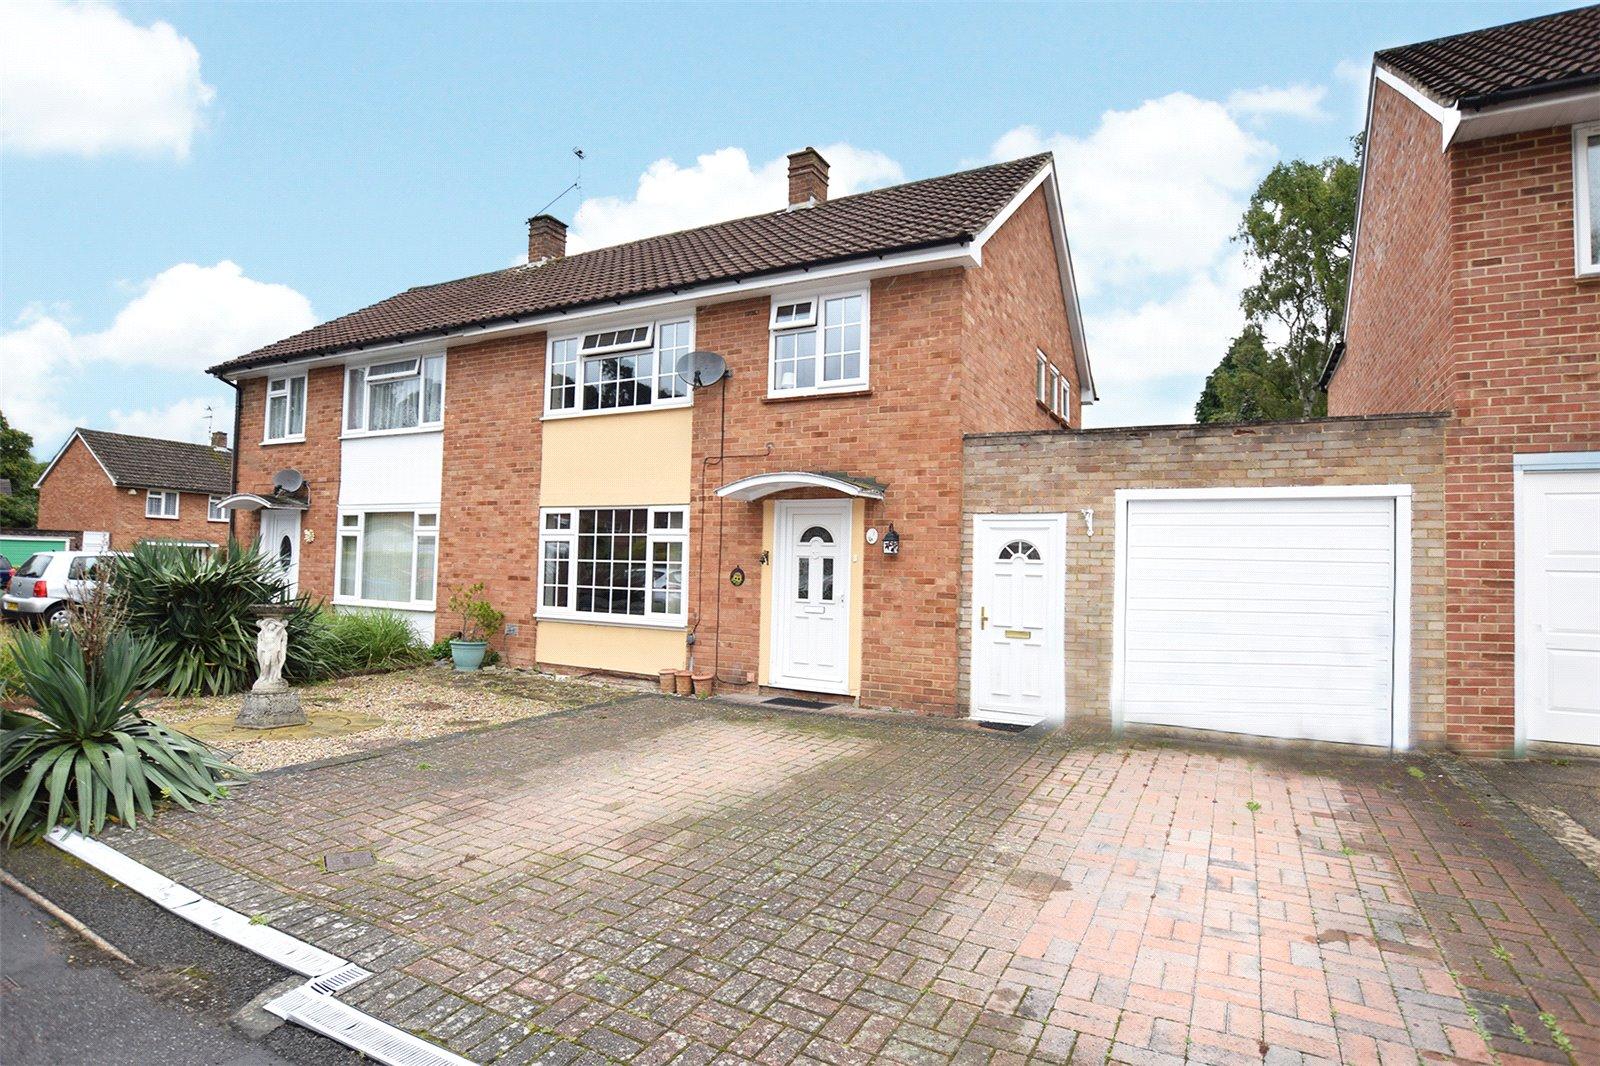 3 Bedrooms Semi Detached House for sale in Timline Green, Bracknell, Berkshire, RG12